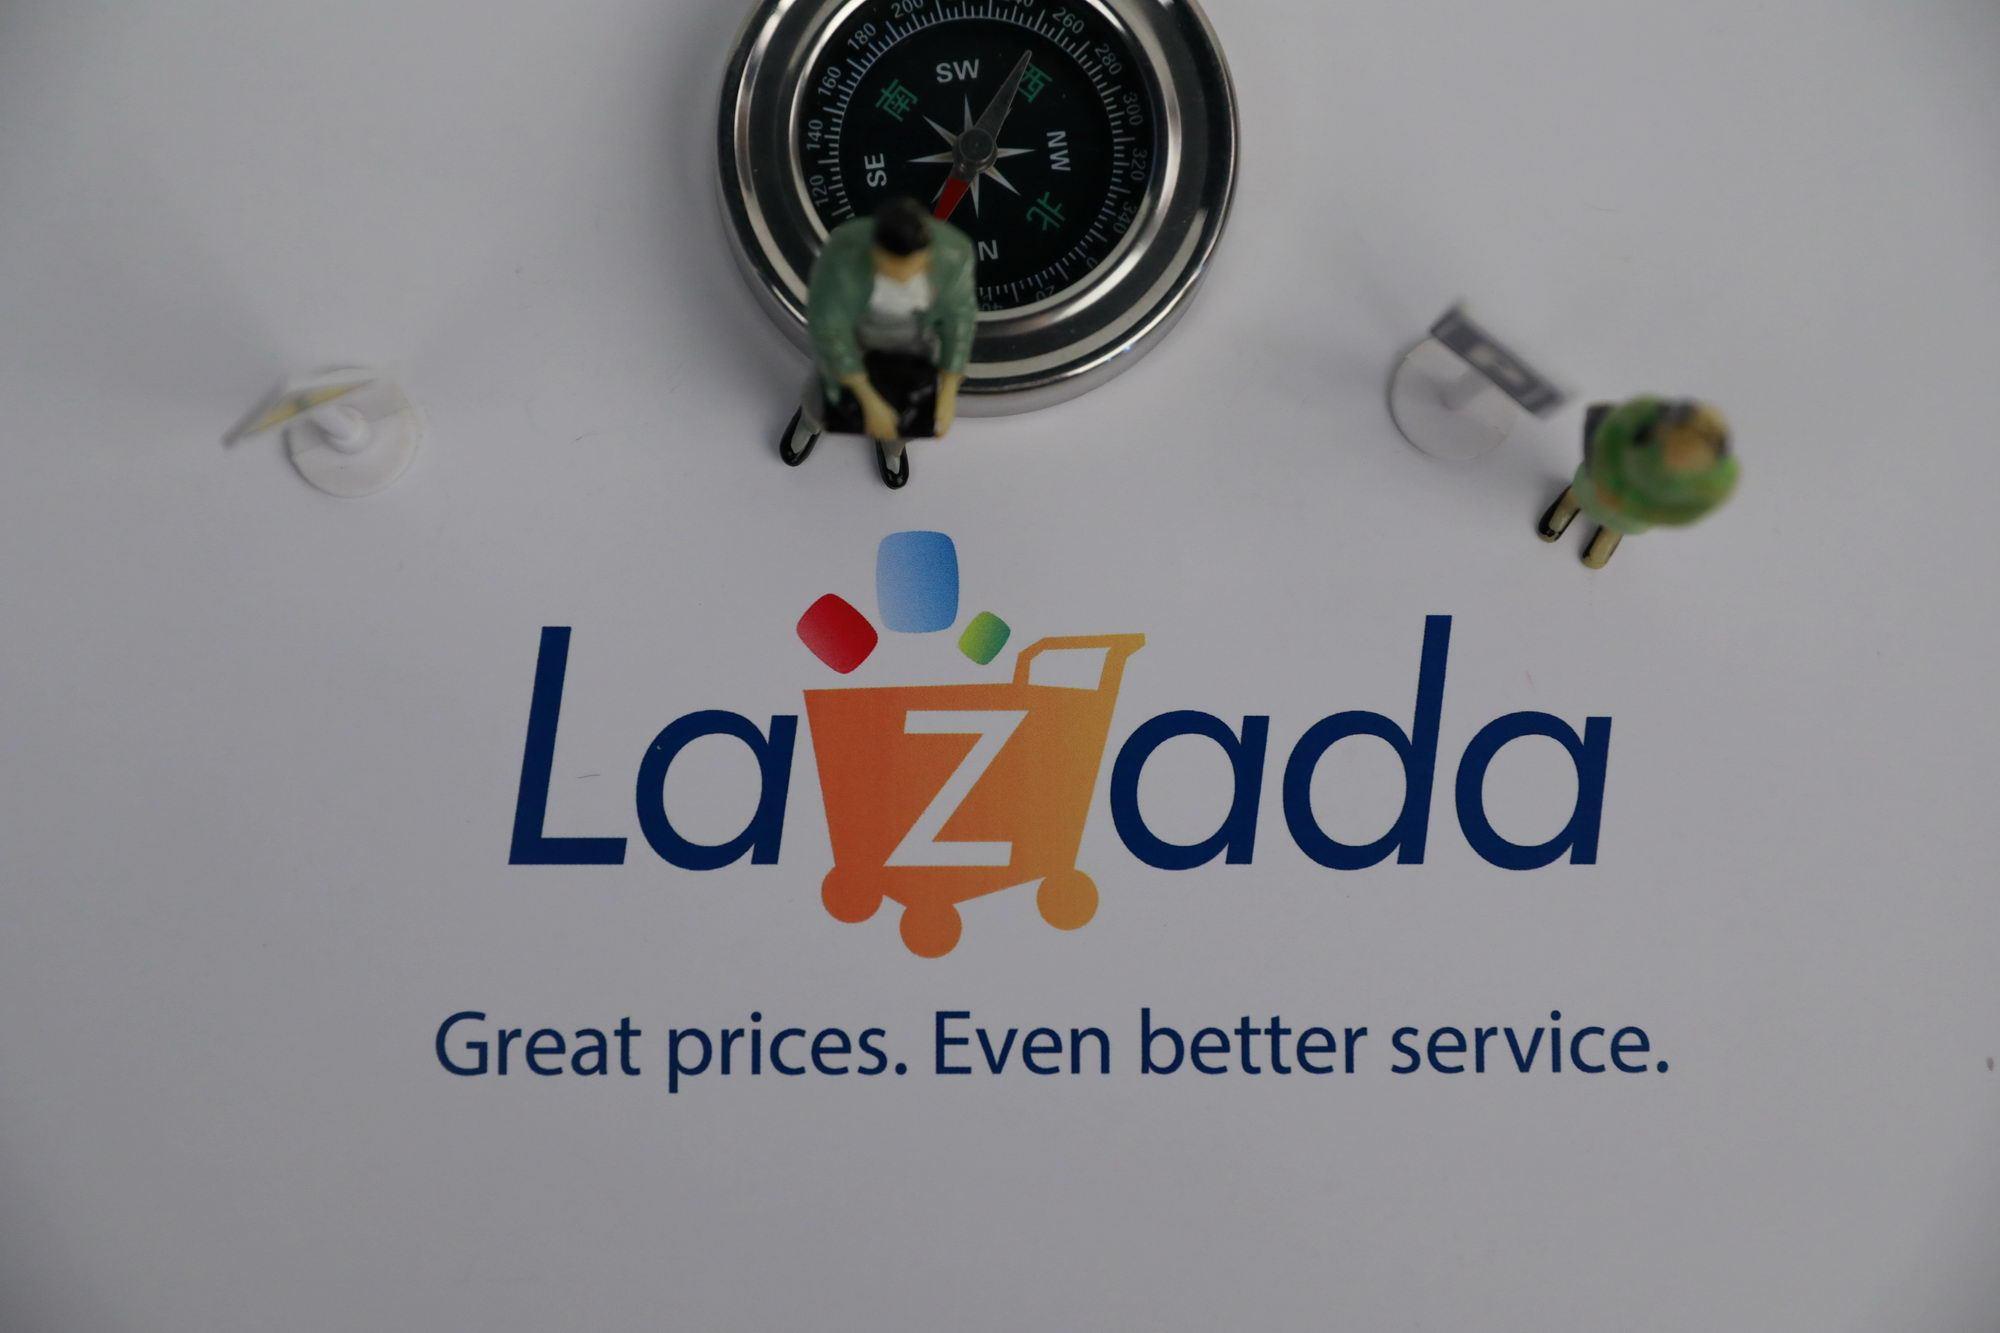 Lazada宣布升级跨境物流网络